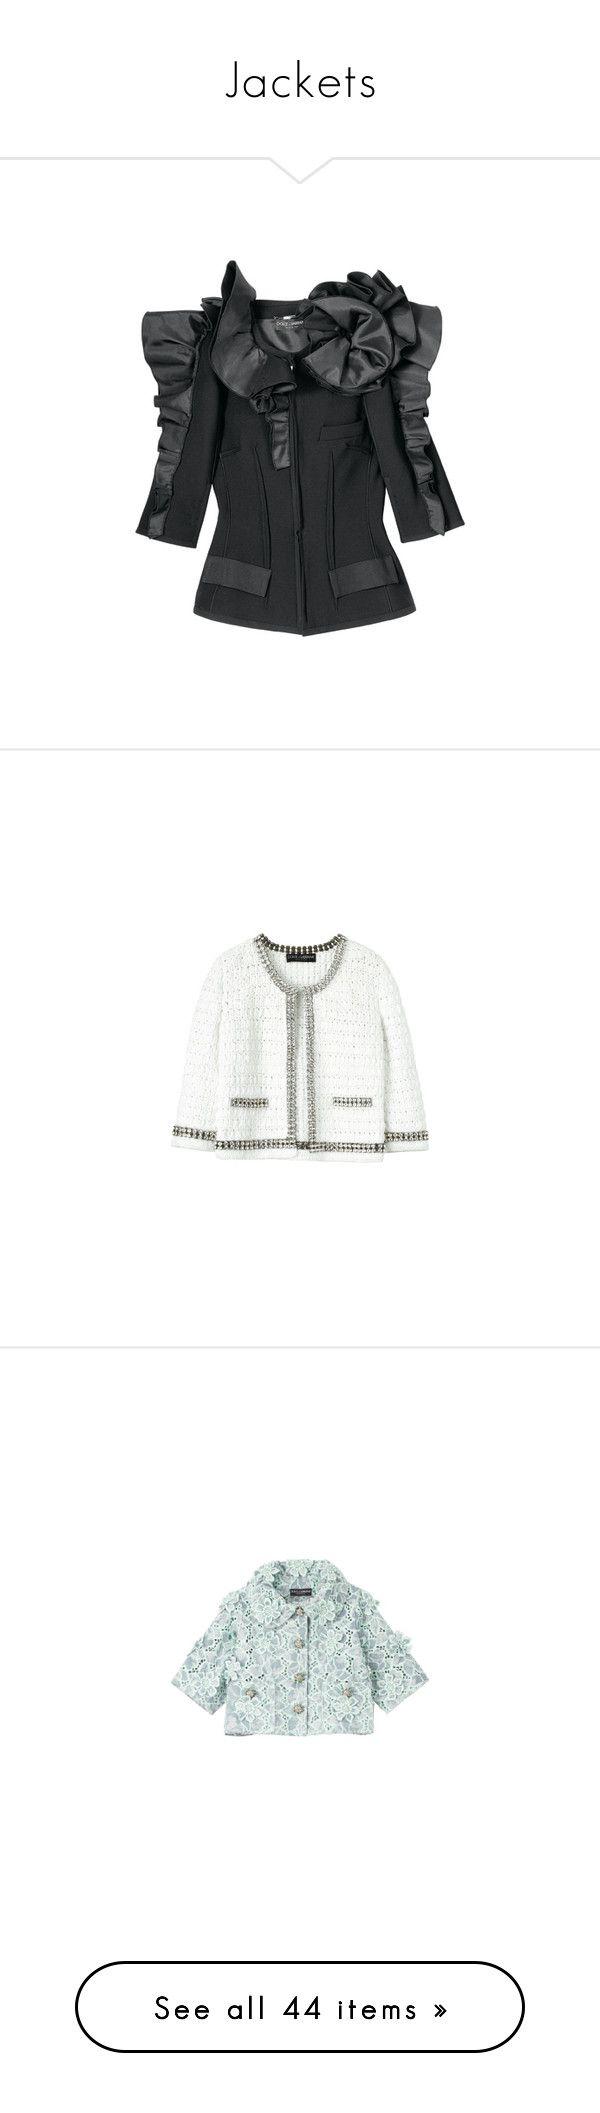 """Jackets"" by jujubeeluvsu ❤ liked on Polyvore featuring outerwear, jackets, tops, coats, ruffle jacket, dolce gabbana jacket, silk jacket, blazers, blazer and casacos"